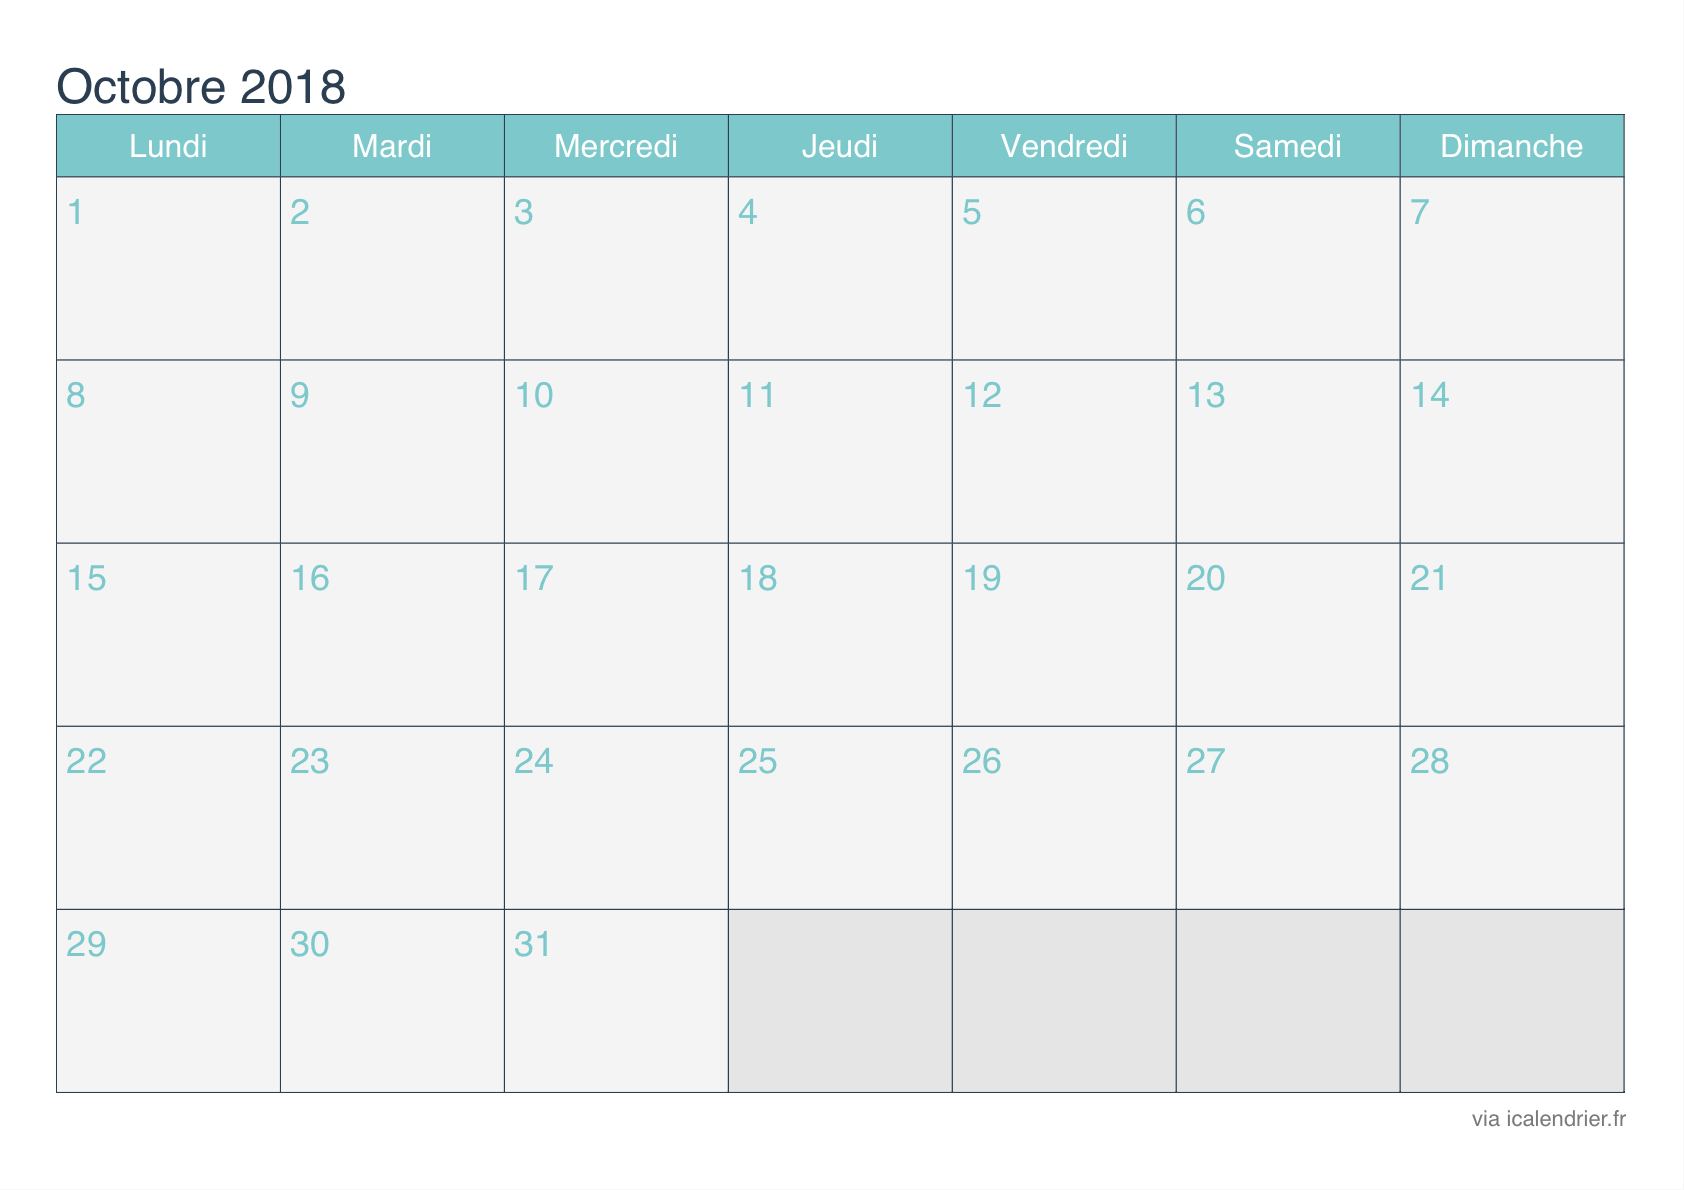 Calendrier Octobre 2018 À Imprimer - Icalendrier concernant Calendrier 2018 A Imprimer Par Mois